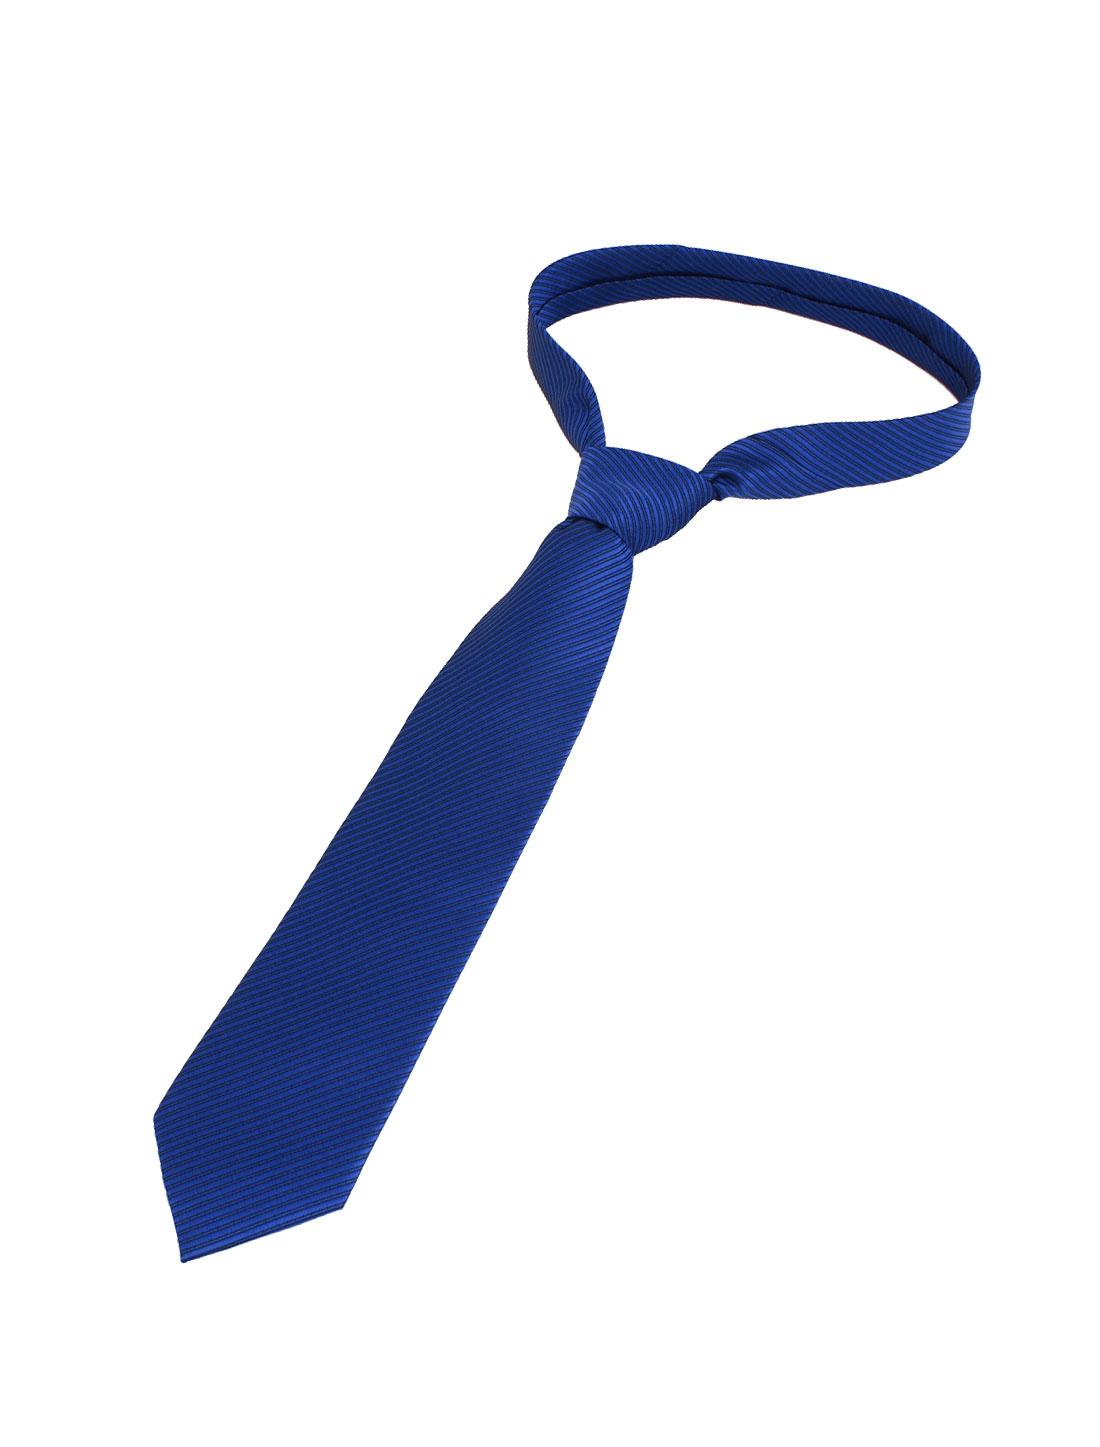 Men Twill Stripes Pattern Polyester Self Tie Adjustable Neckwear Necktie Blue